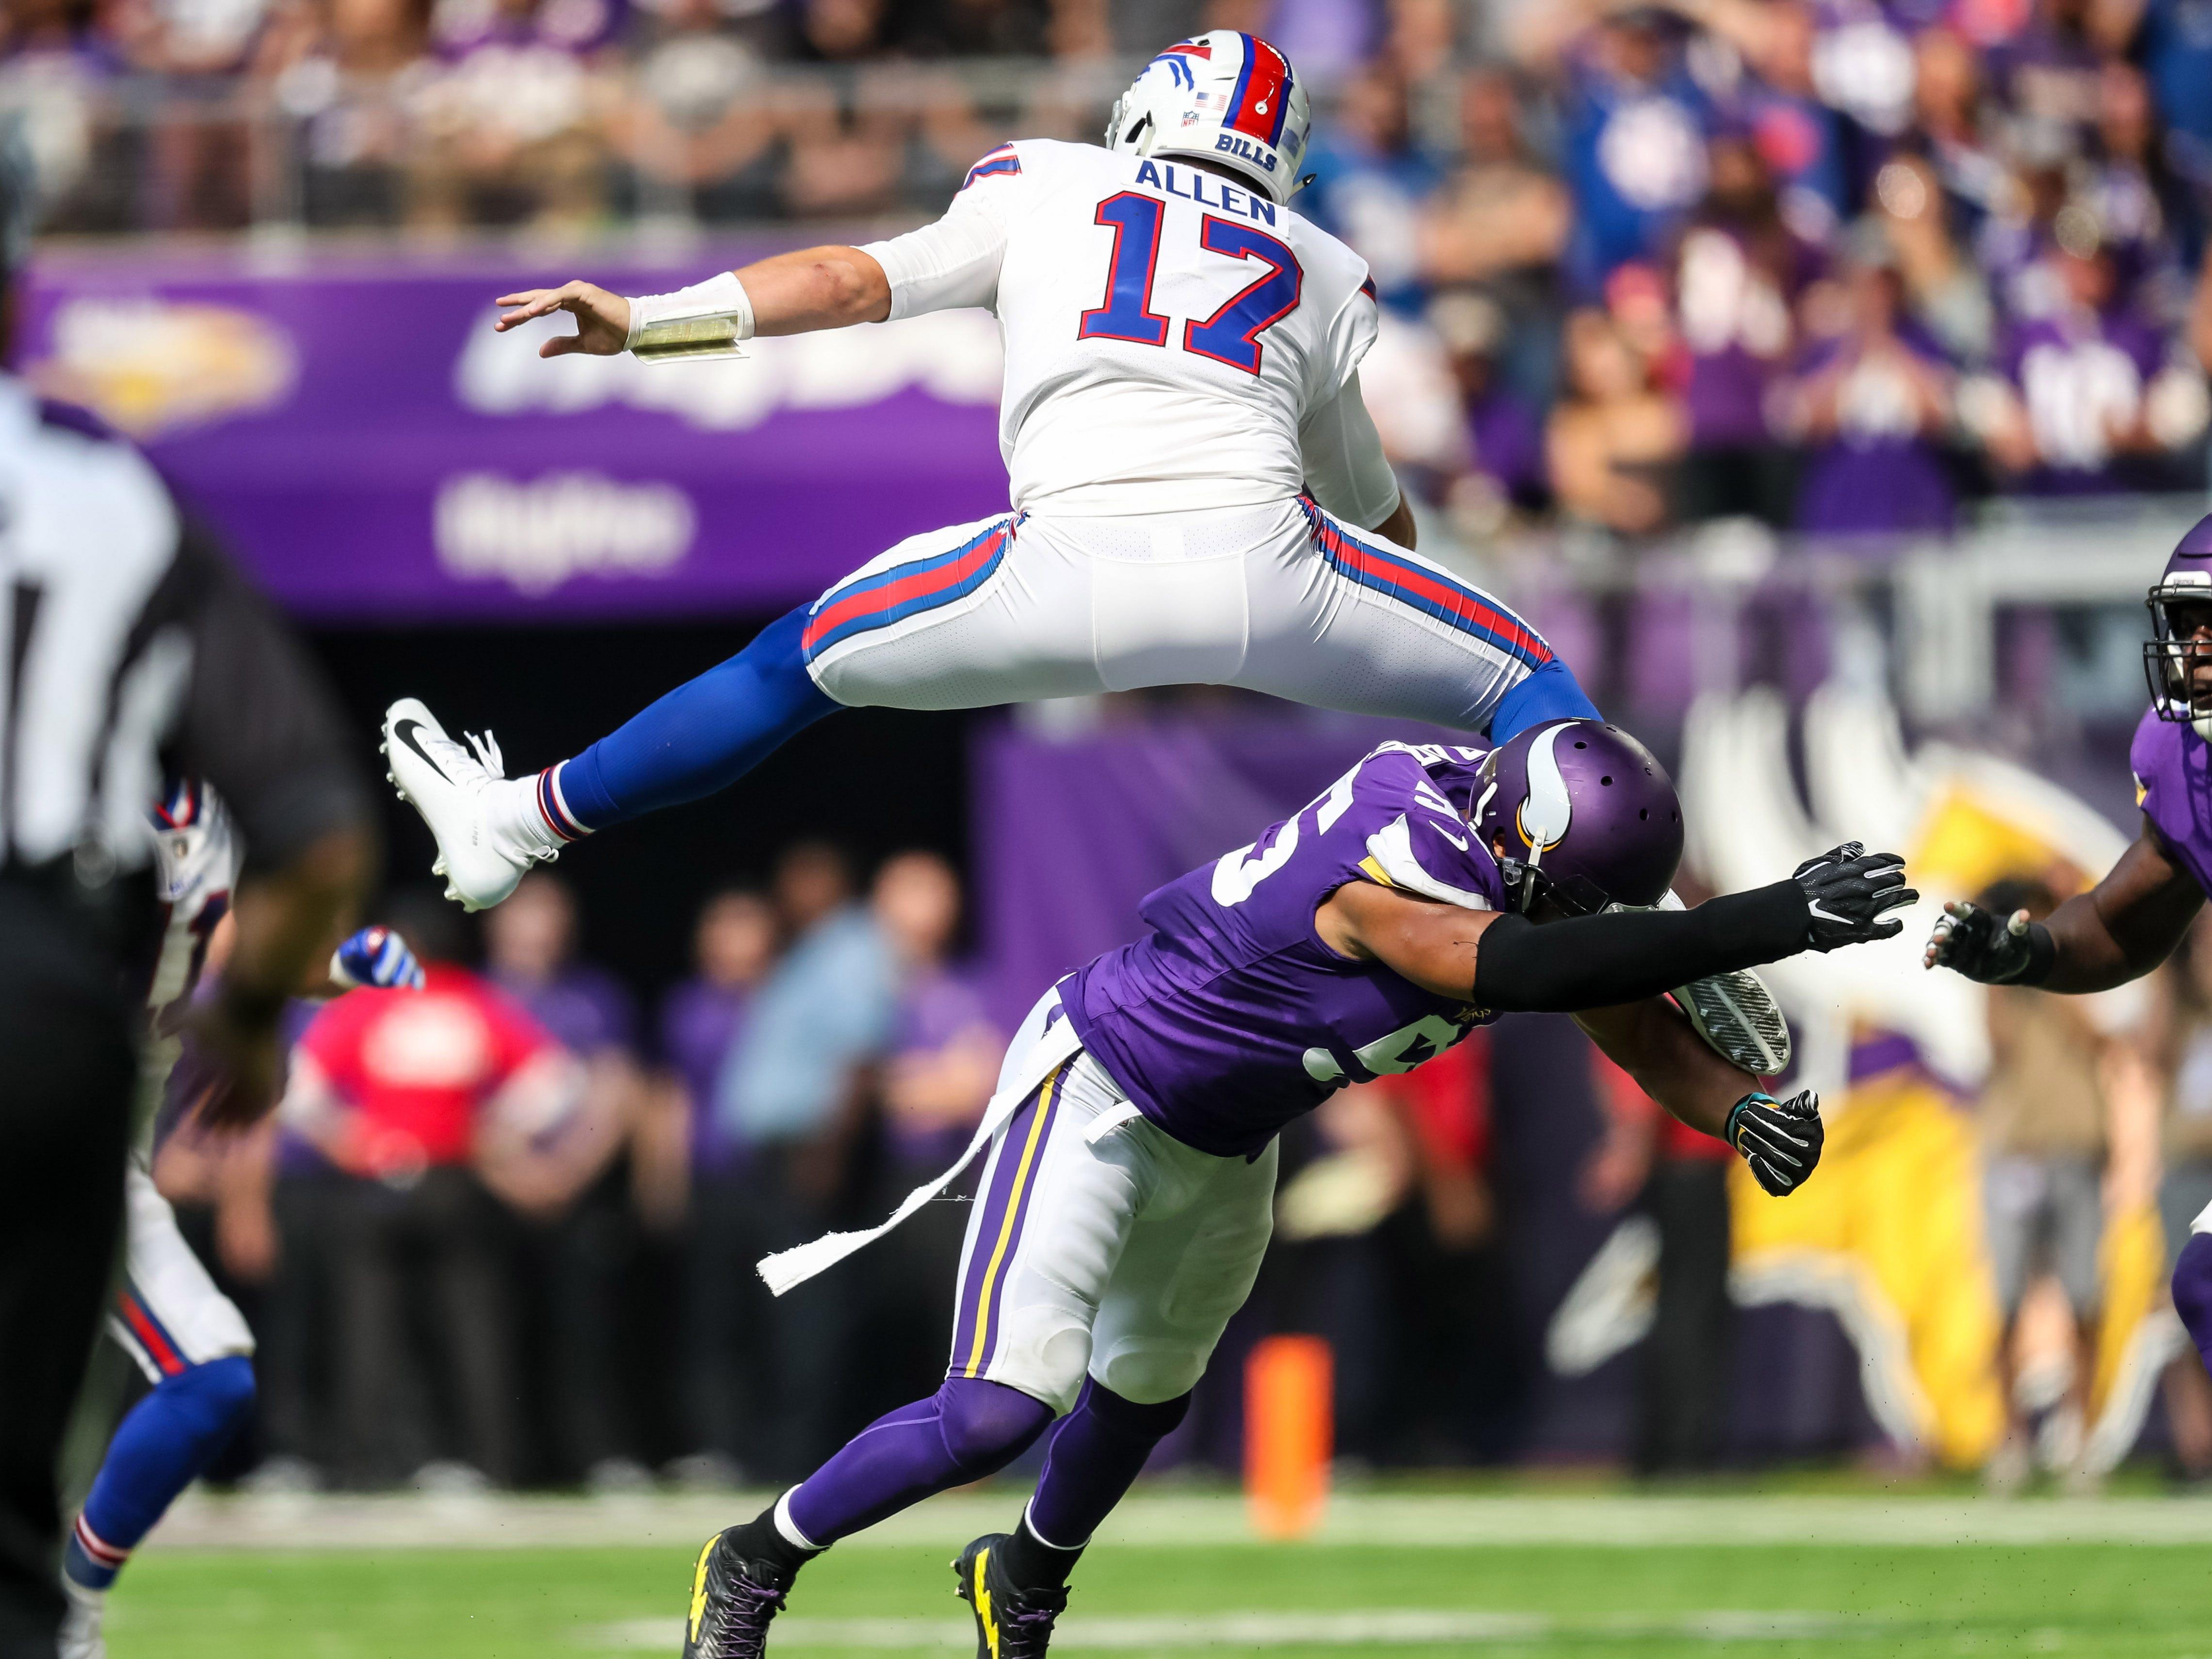 Buffalo Bills quarterback Josh Allen hurdles Minnesota Vikings linebacker Anthony Barr during the first quarter at U.S. Bank Stadium.